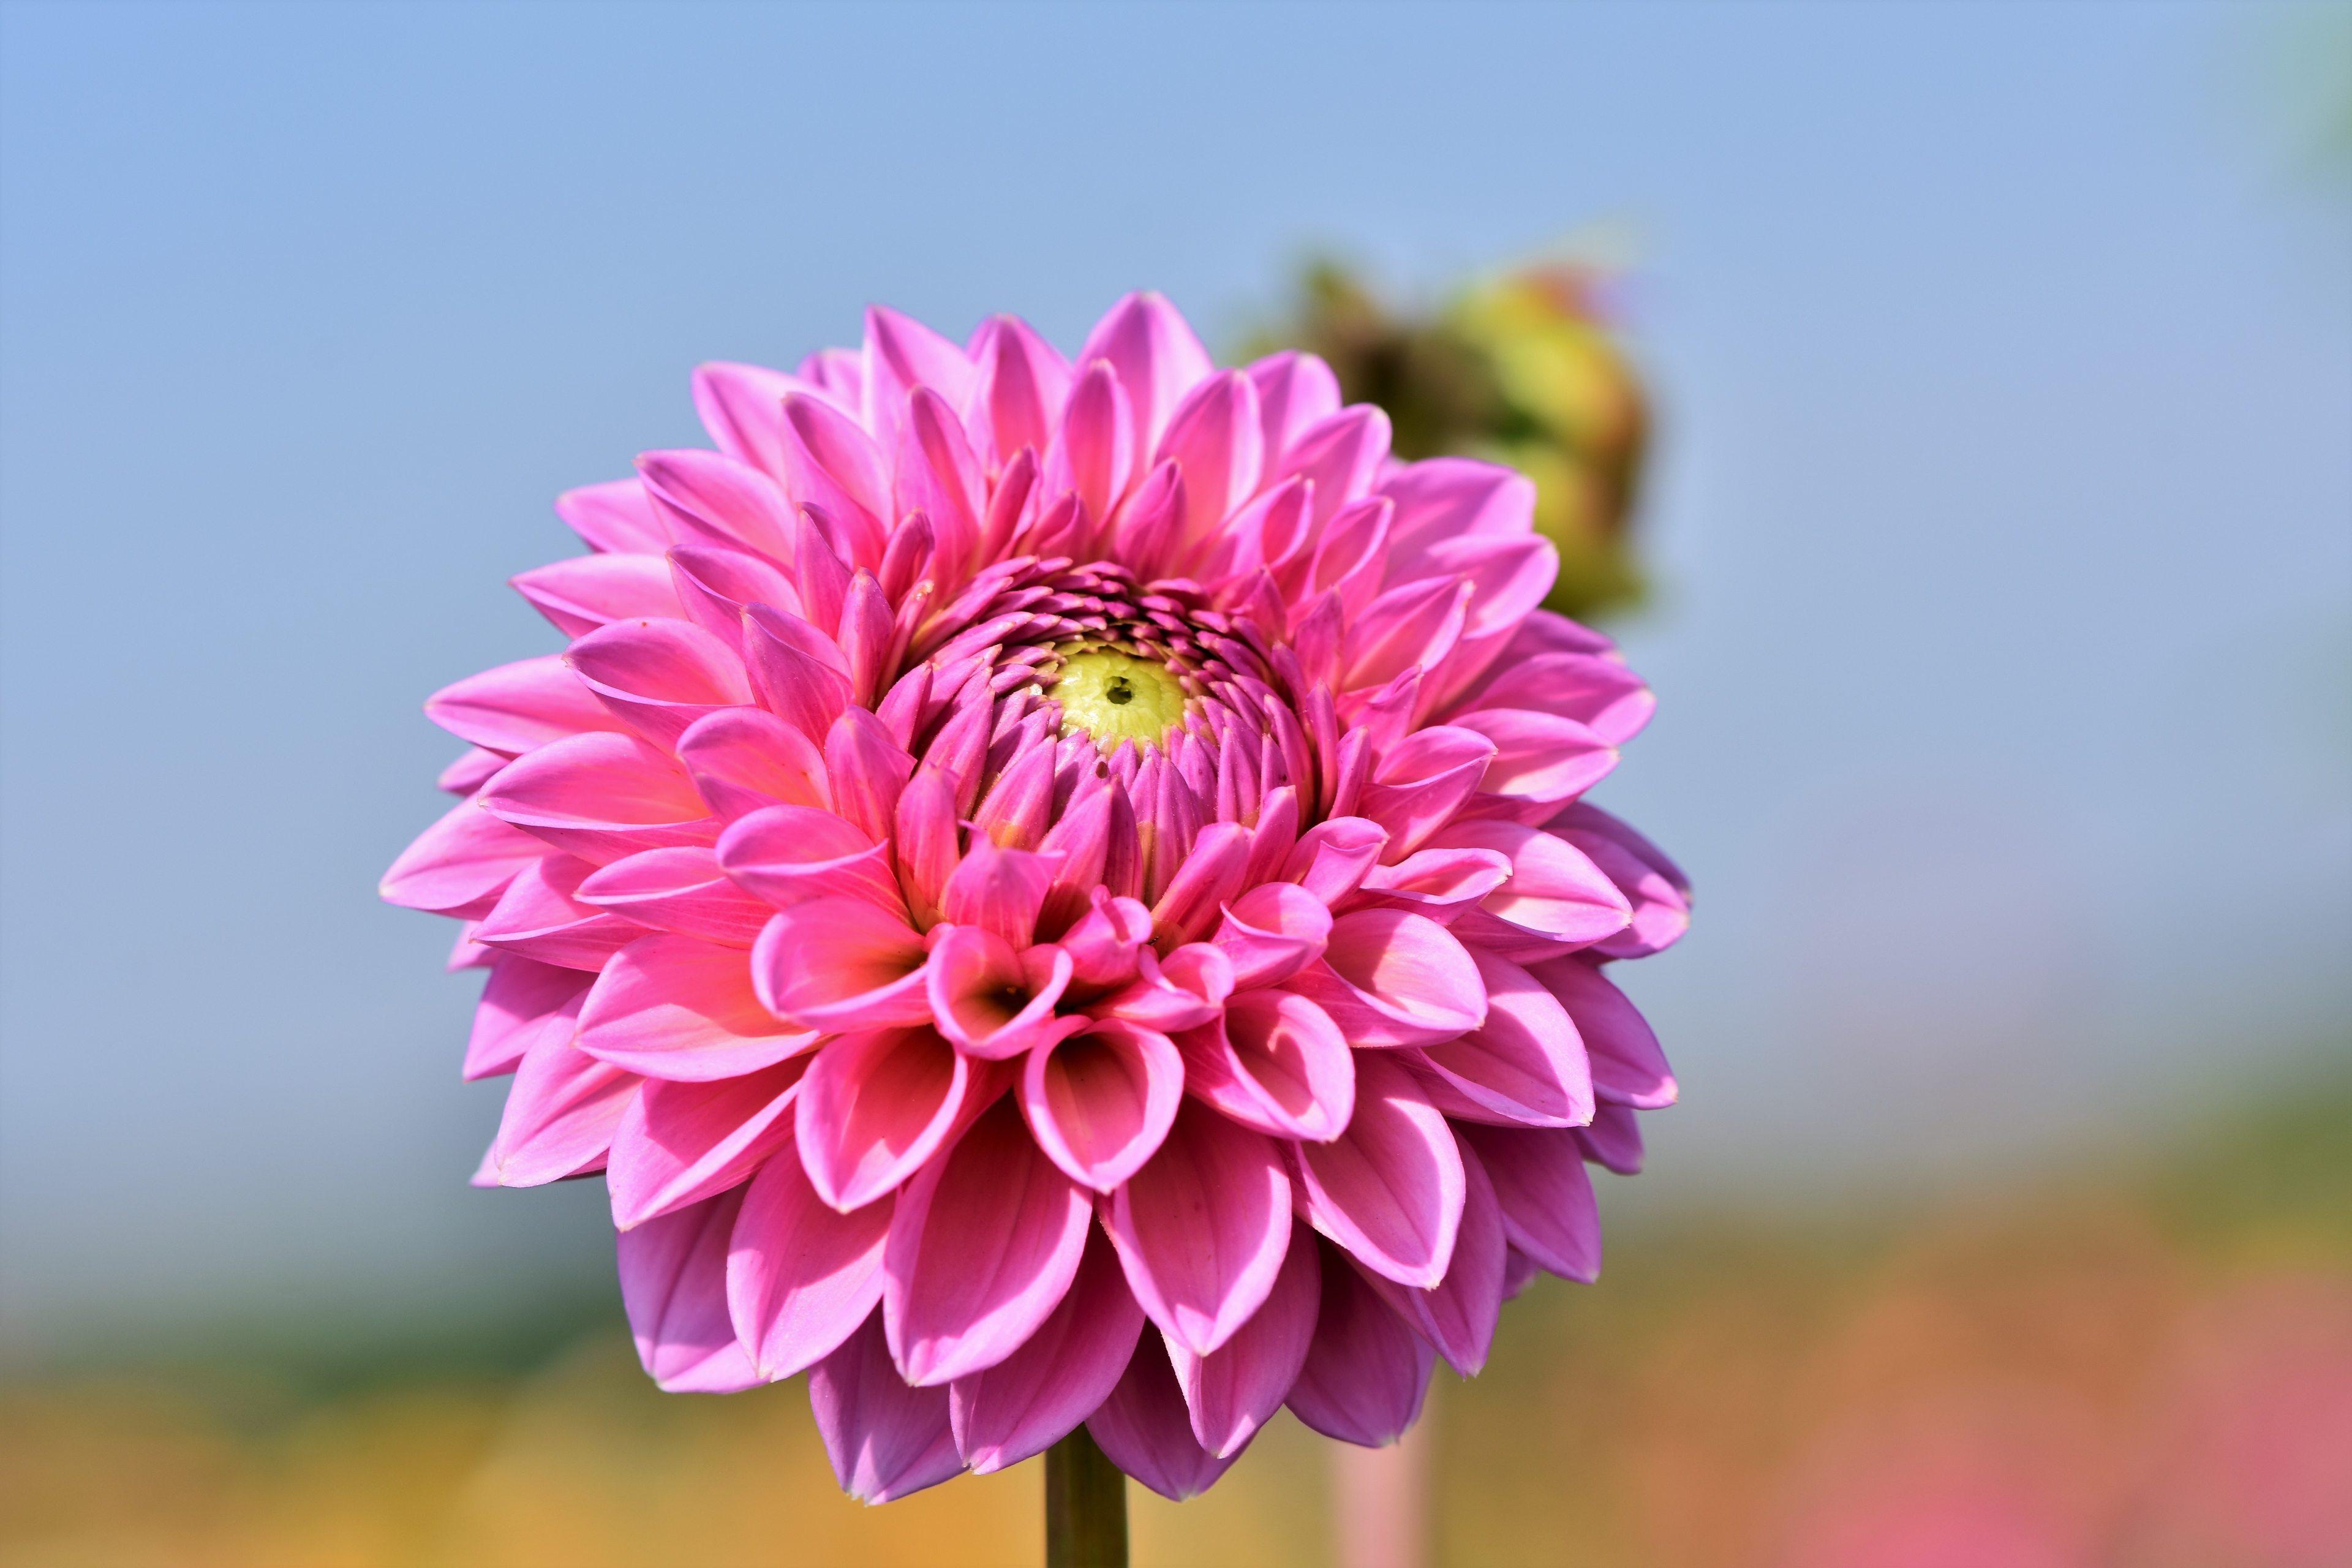 006 Best Dahlia Flower Wallpaper 4k Resolution Best Flower Wallpaper Hd 4k 3840x2560 Wallpaper Teahub Io